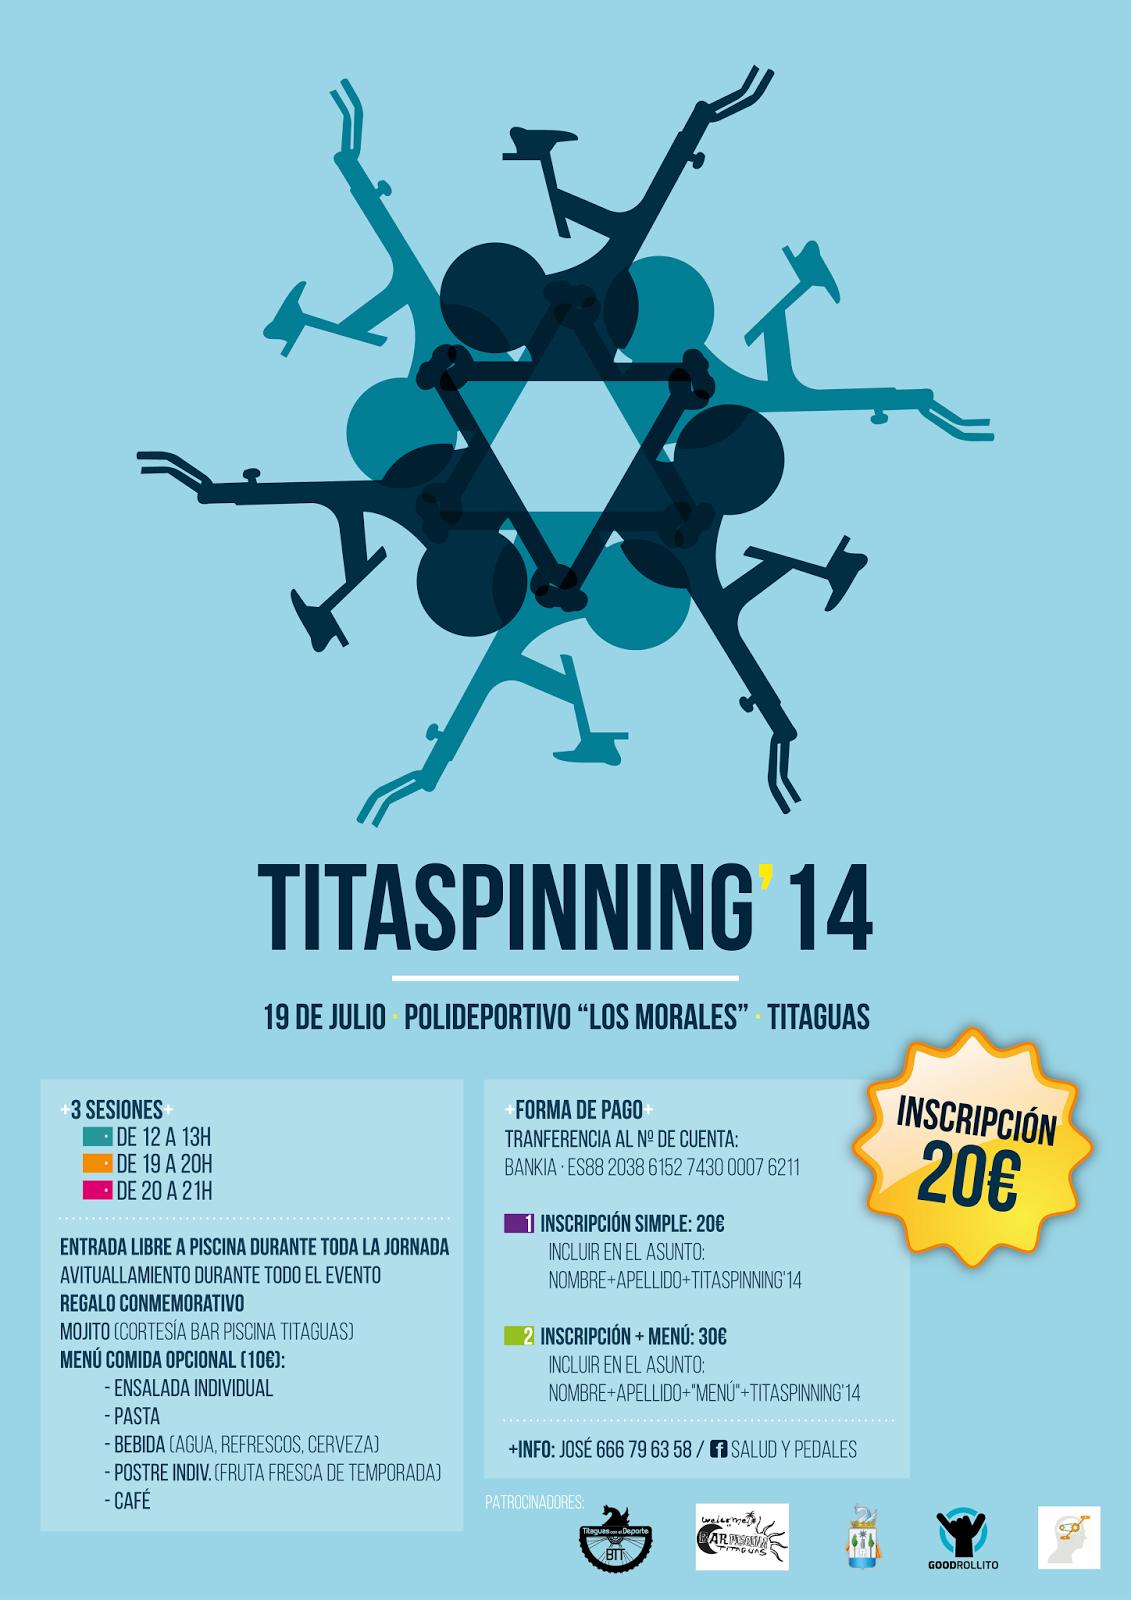 http://www.titaguasconeldeporte.com/p/titaspinning-14.html